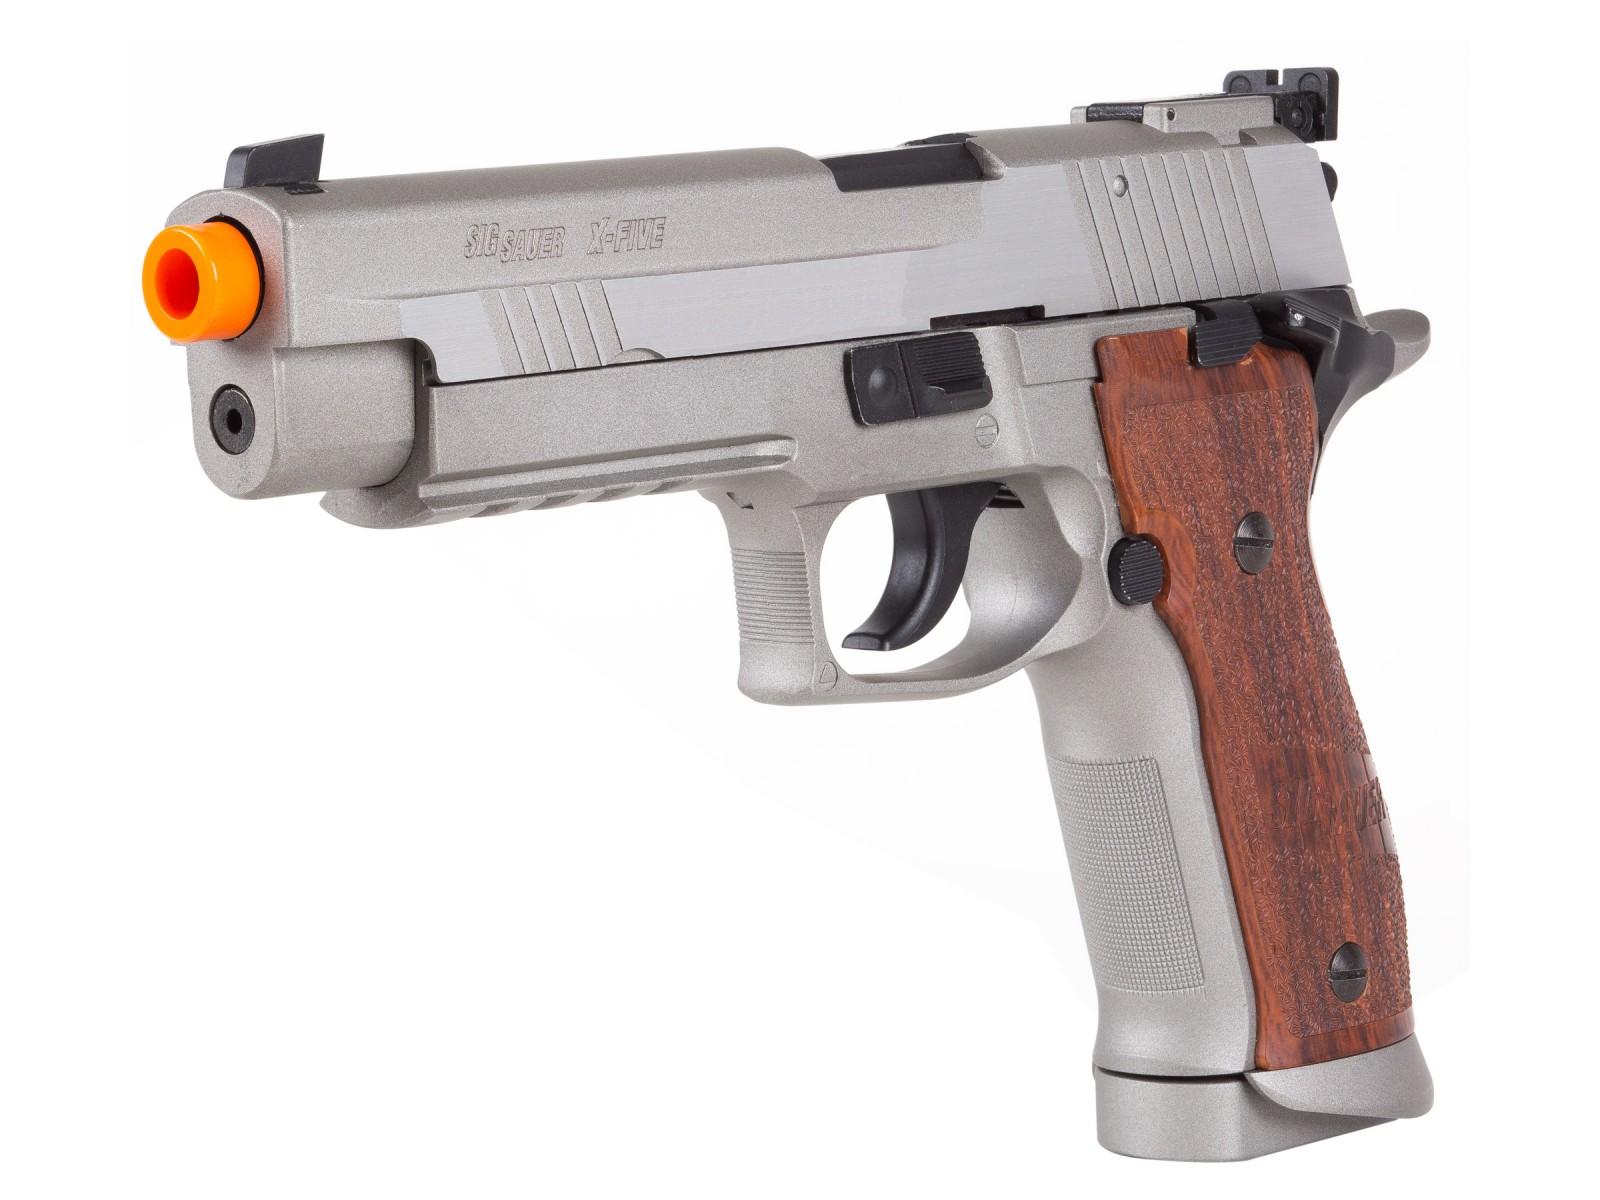 Cheap SIG Sauer P226 X-FIVE Metal Co2 GBB Airsoft Pistol, Silver 6mm